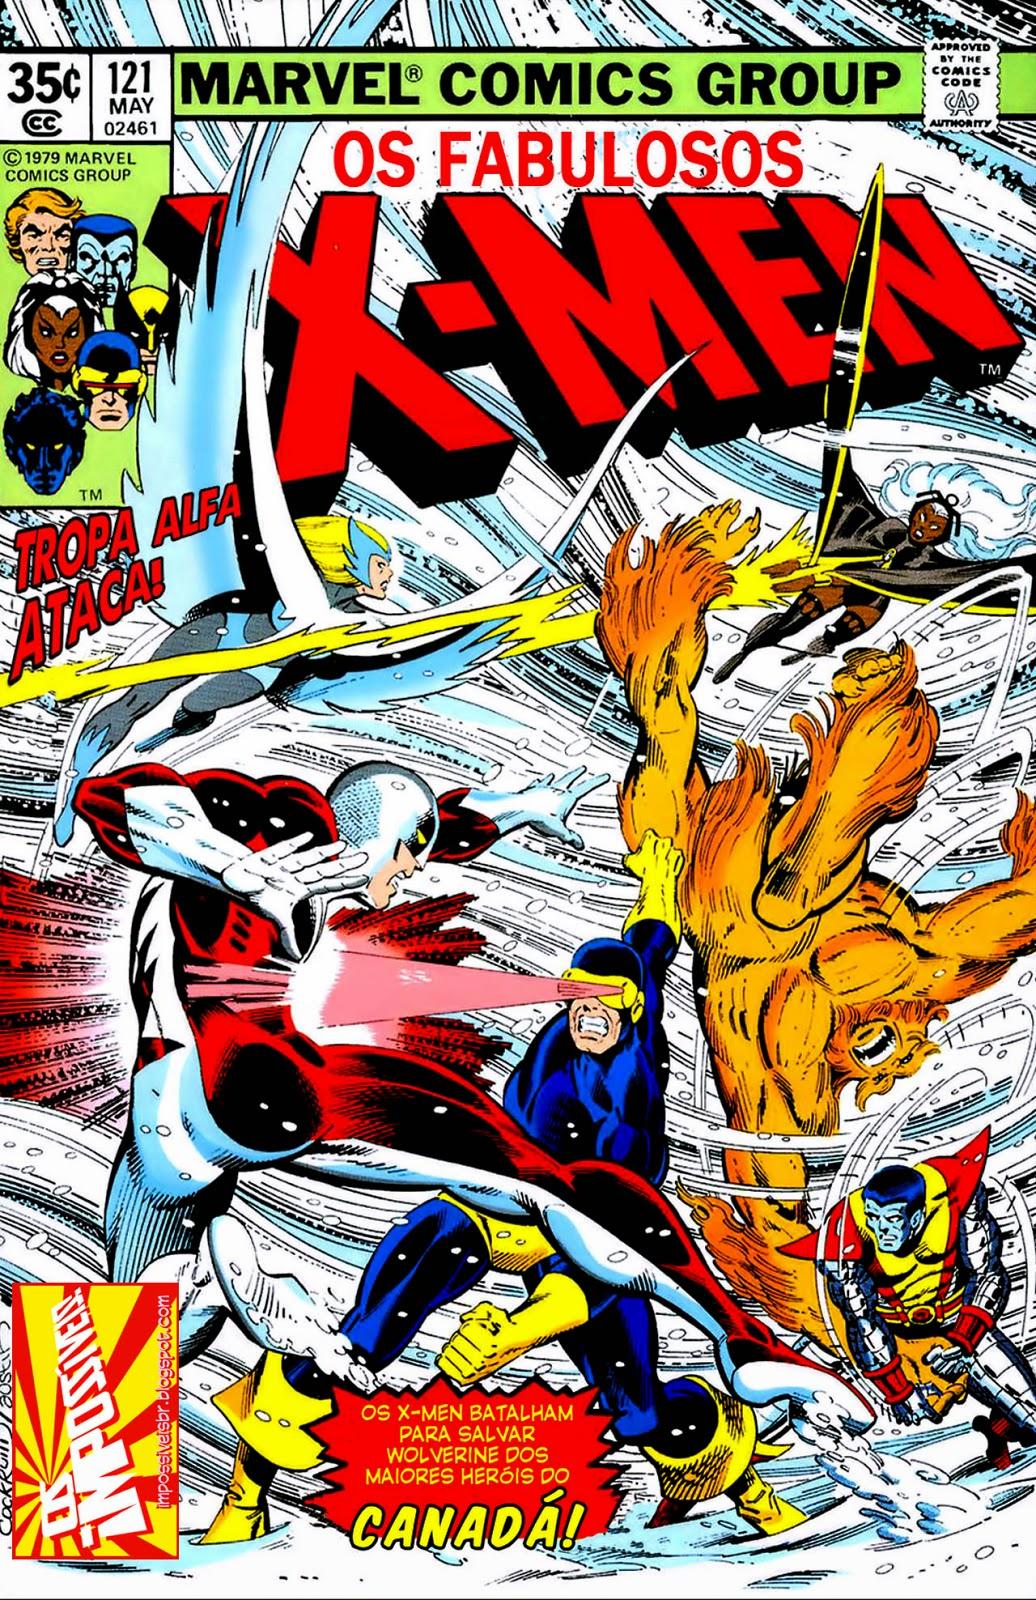 http://www.mediafire.com/download/aghgj2c5boqr7ex/Os.Fabulosos.X-Men.(X-Men.V1).121.HQBR.09NOV13.Os.Impossiveis.cbr